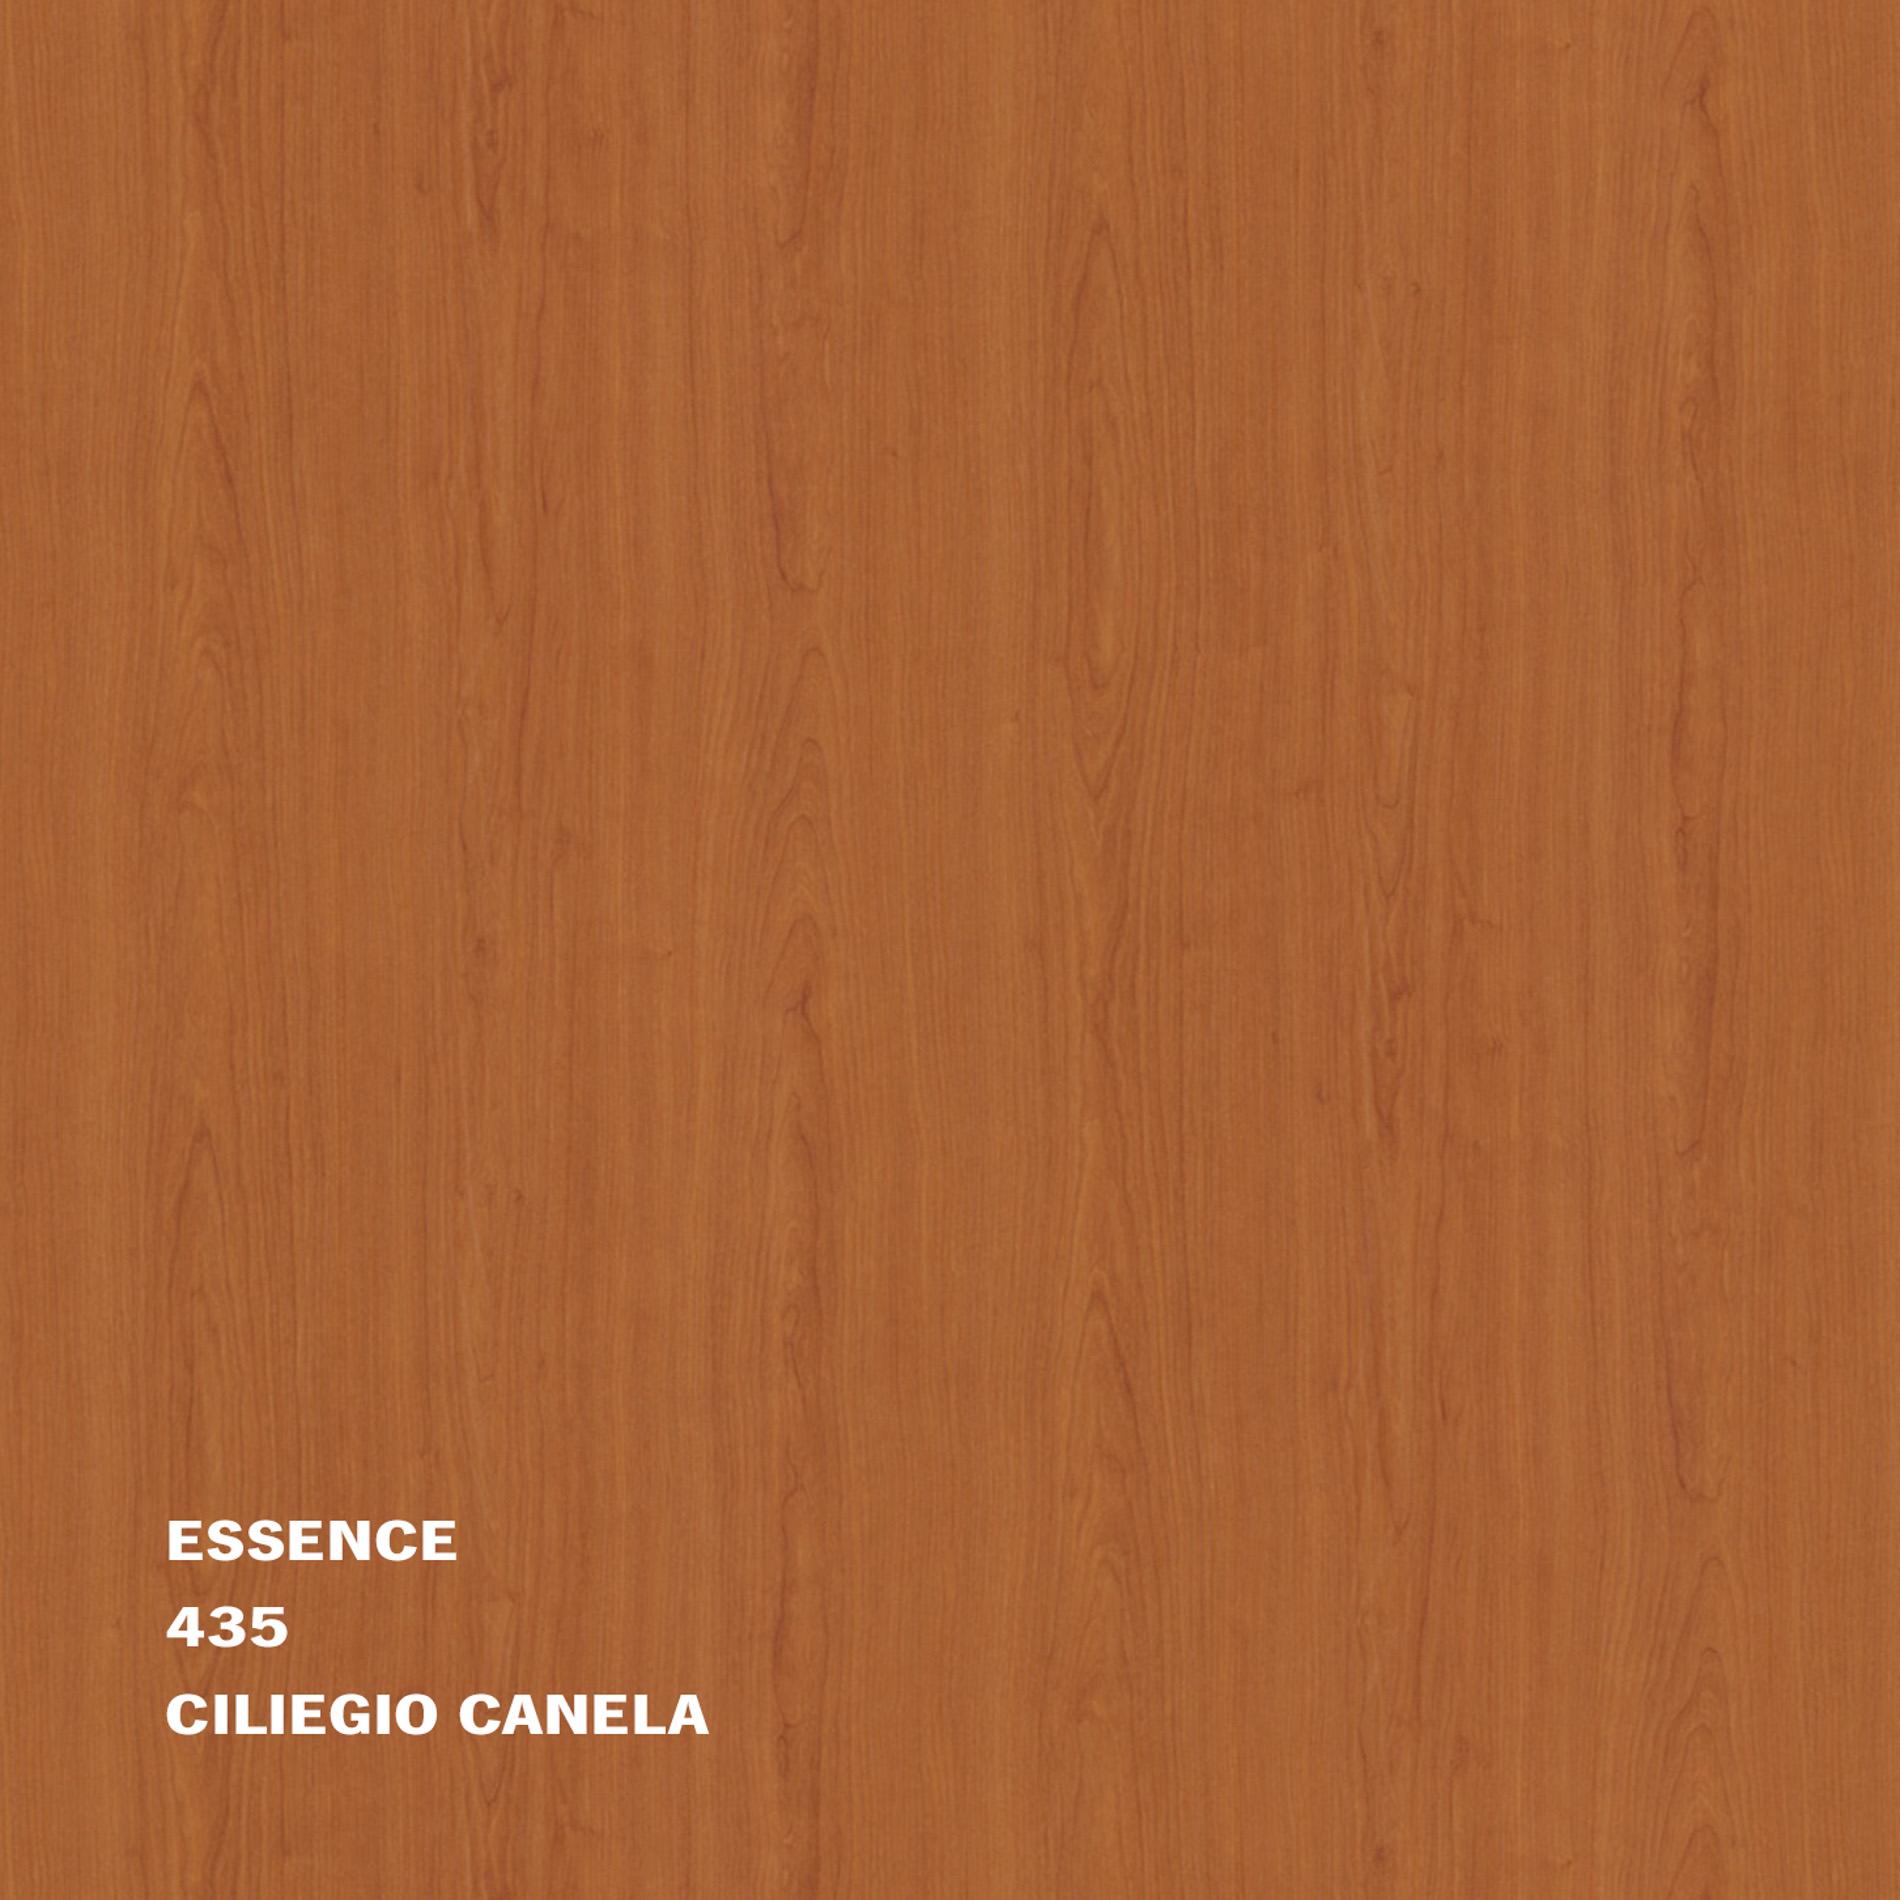 435_Cerezo_canela_ESSENCE